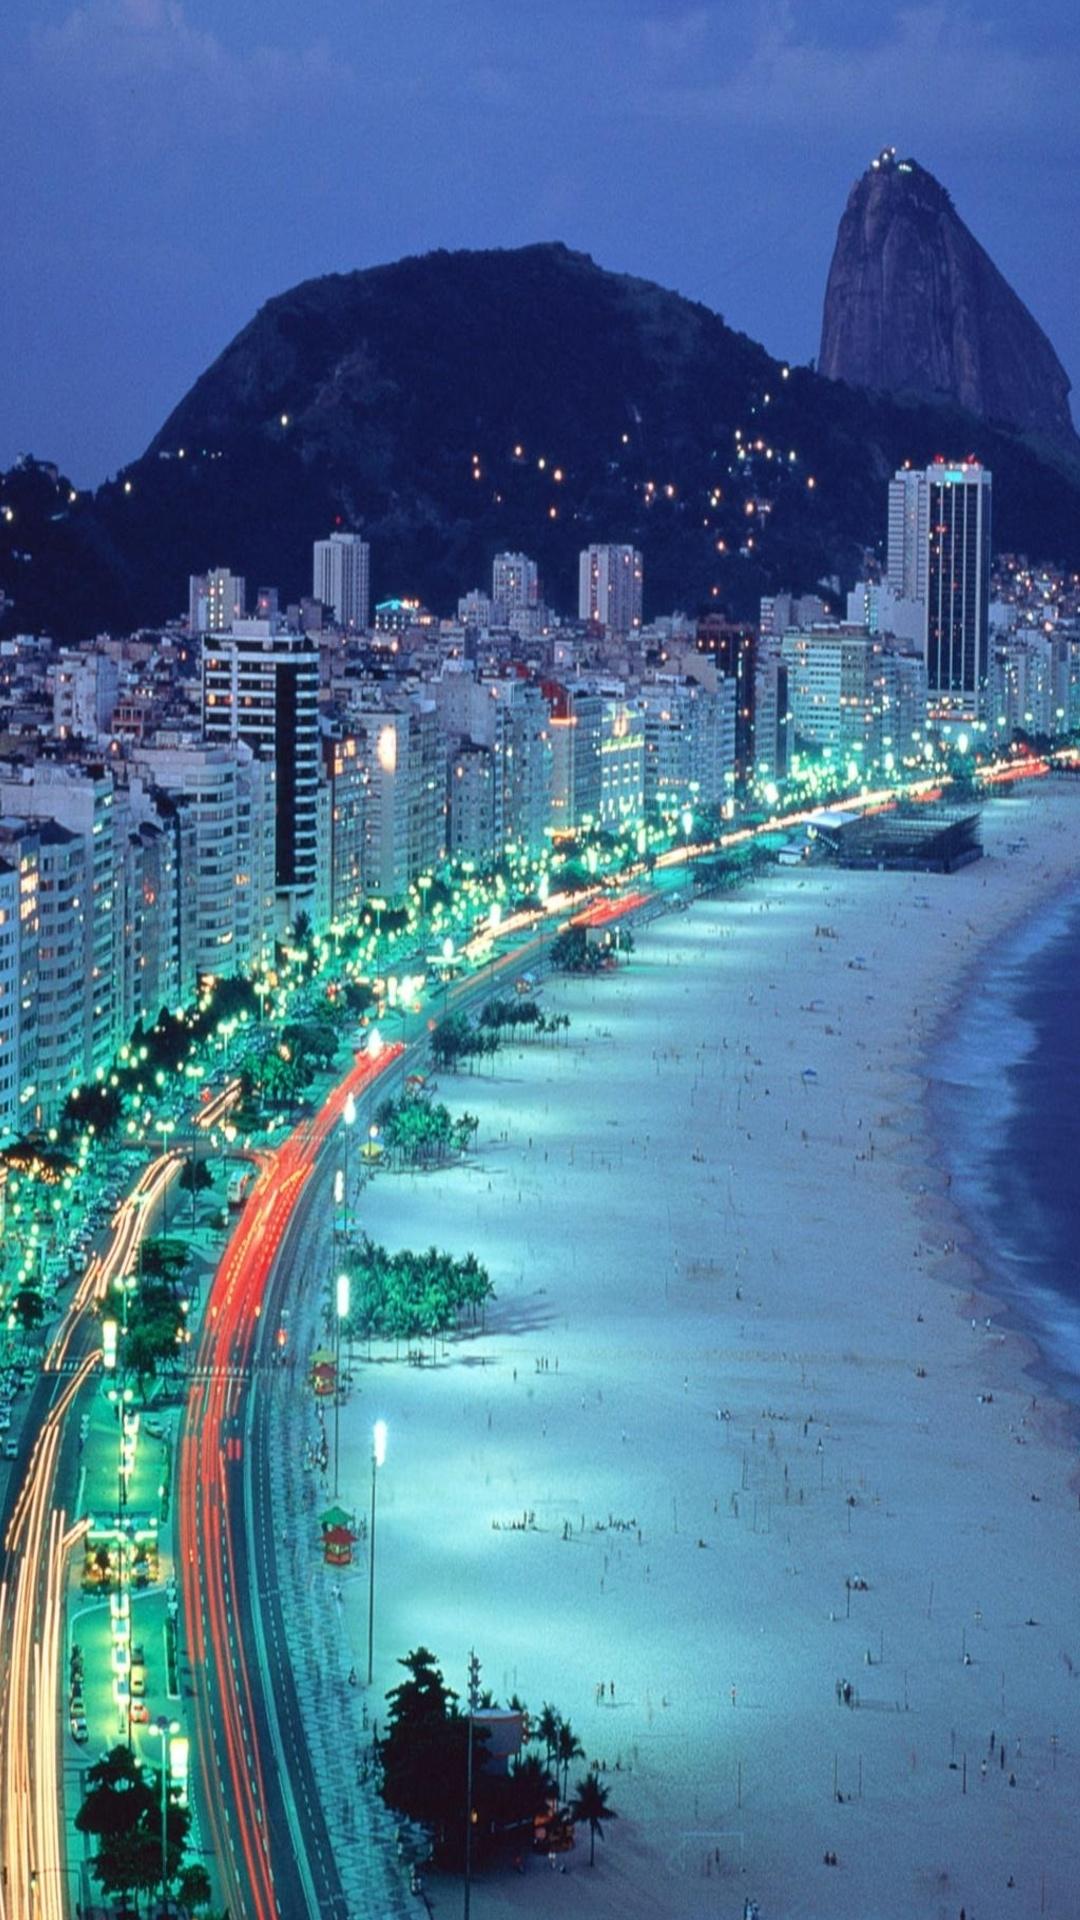 Iphone Rio De Janeiro Wallpaper Full HD Pictures 1080x1920